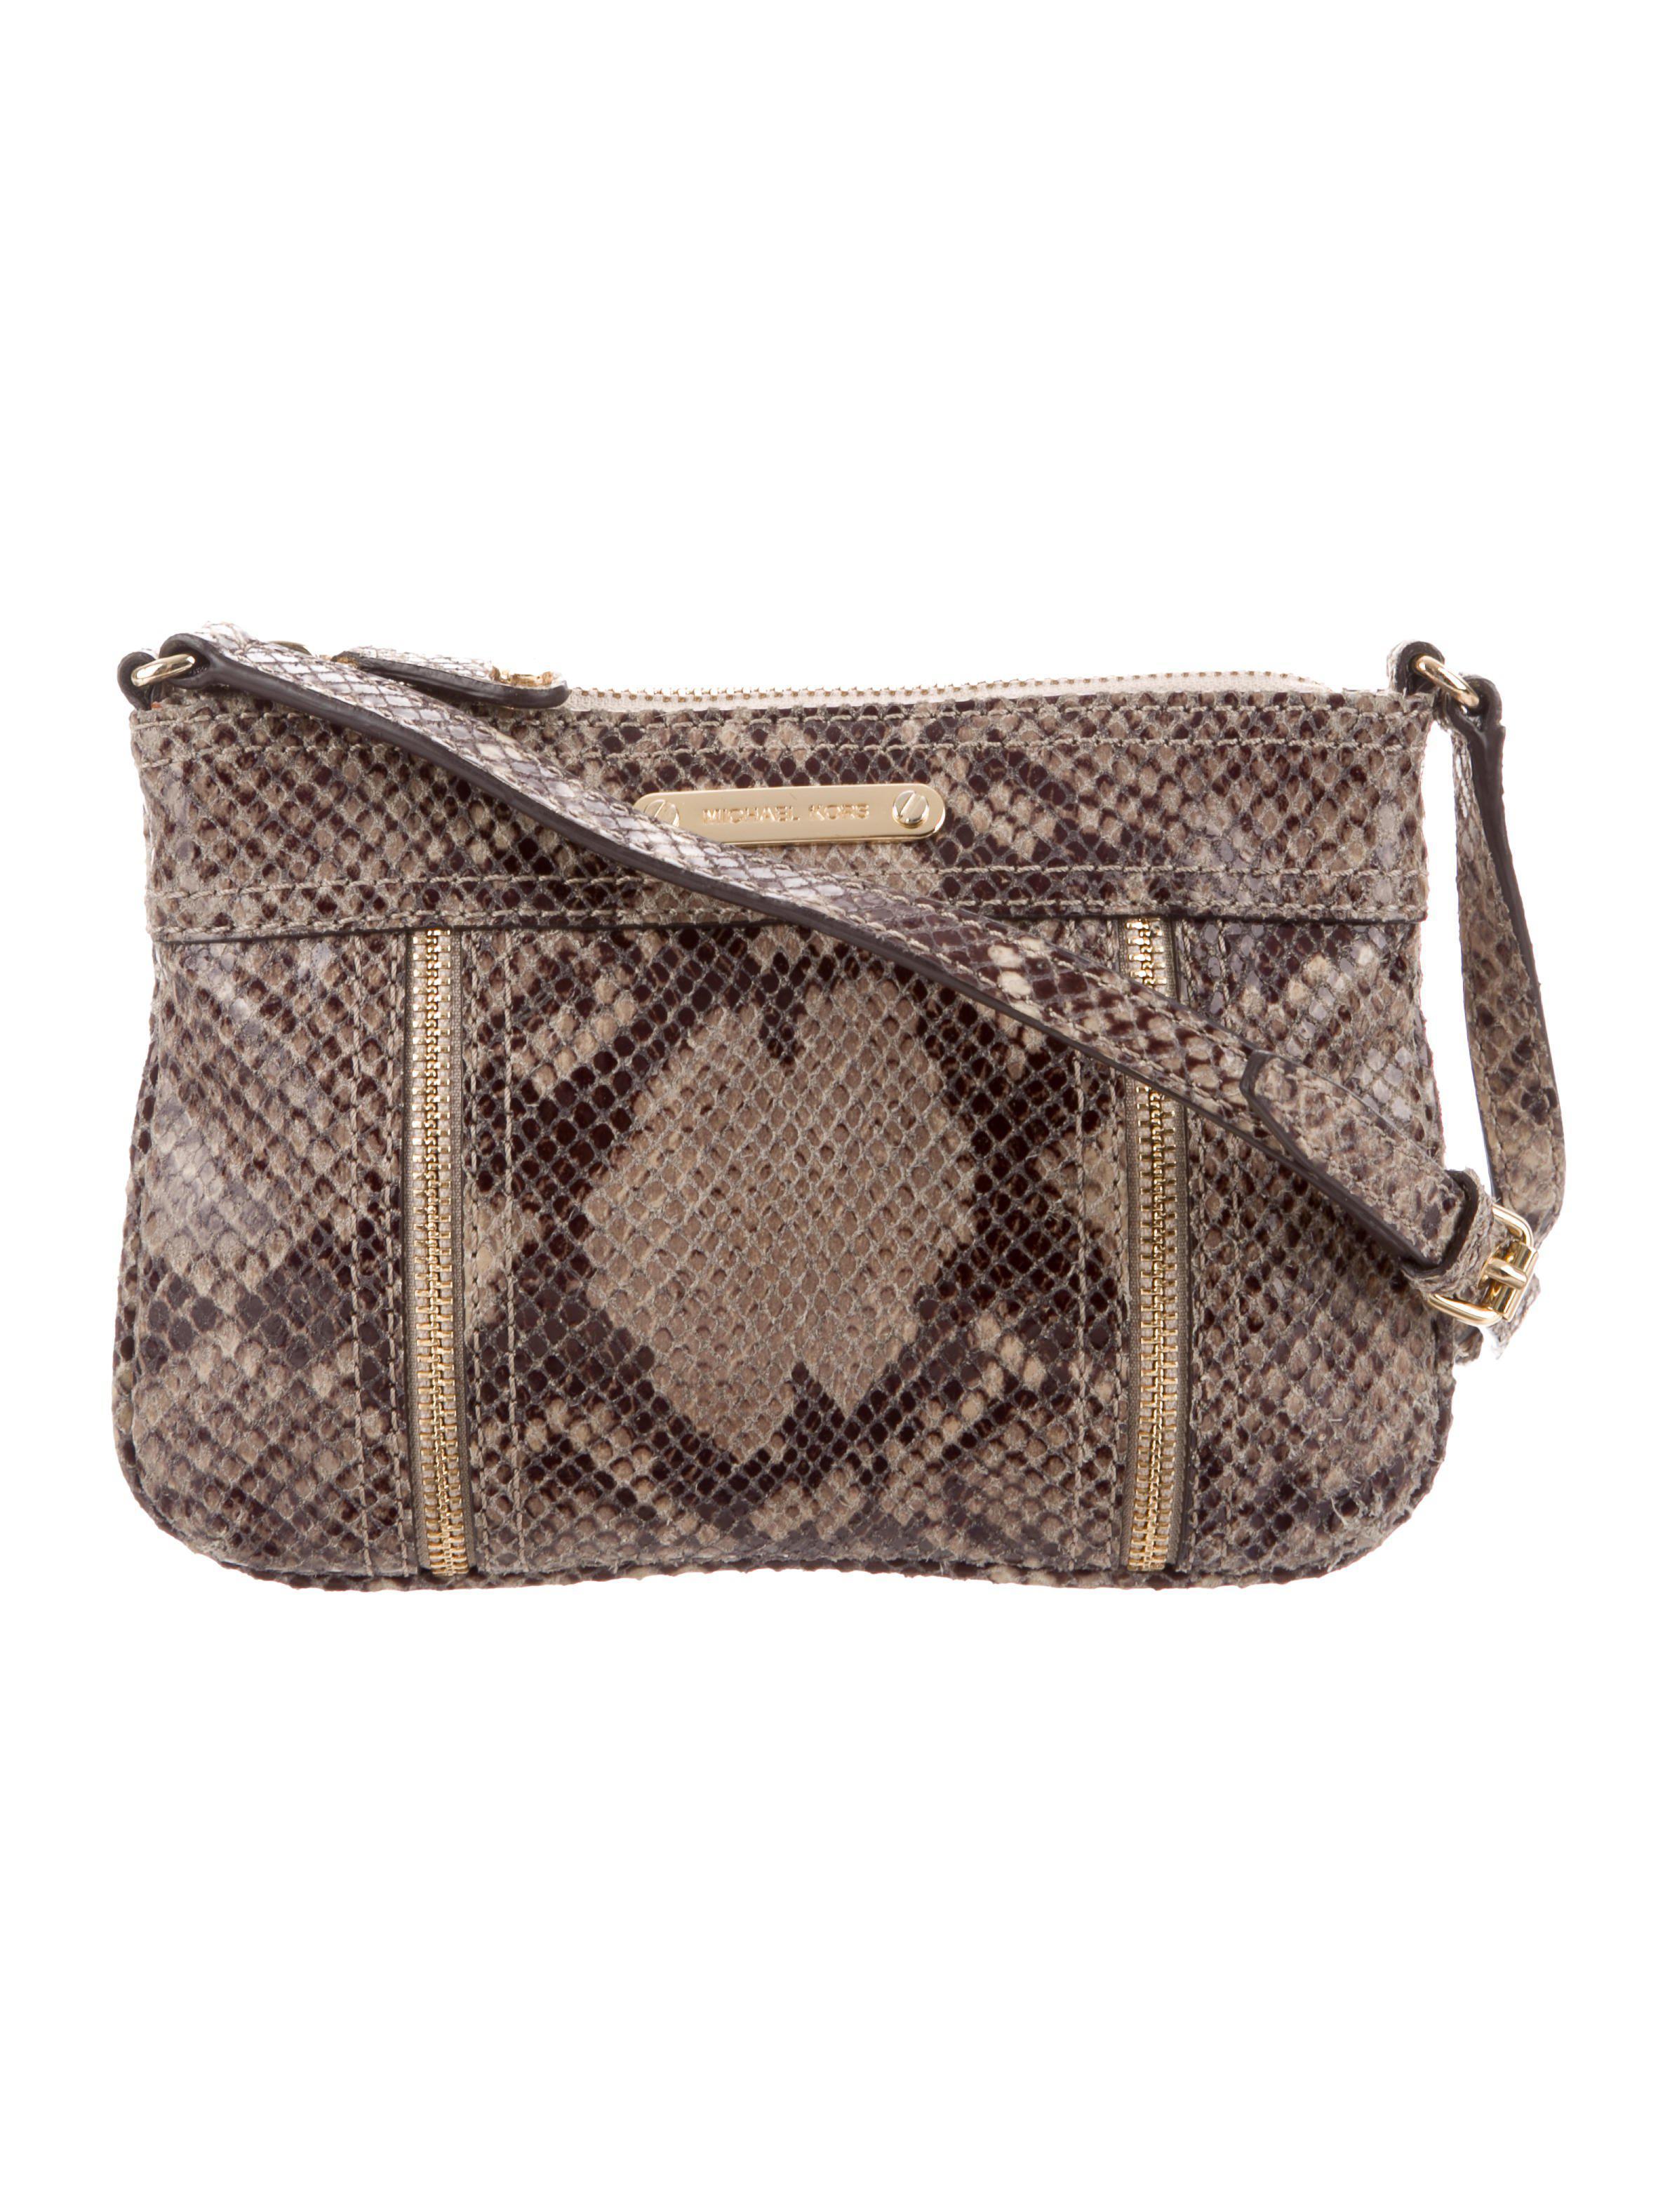 5893140f22fb MICHAEL Michael Kors. Women s Metallic Michael Kors Embossed Crossbody Bag  Beige